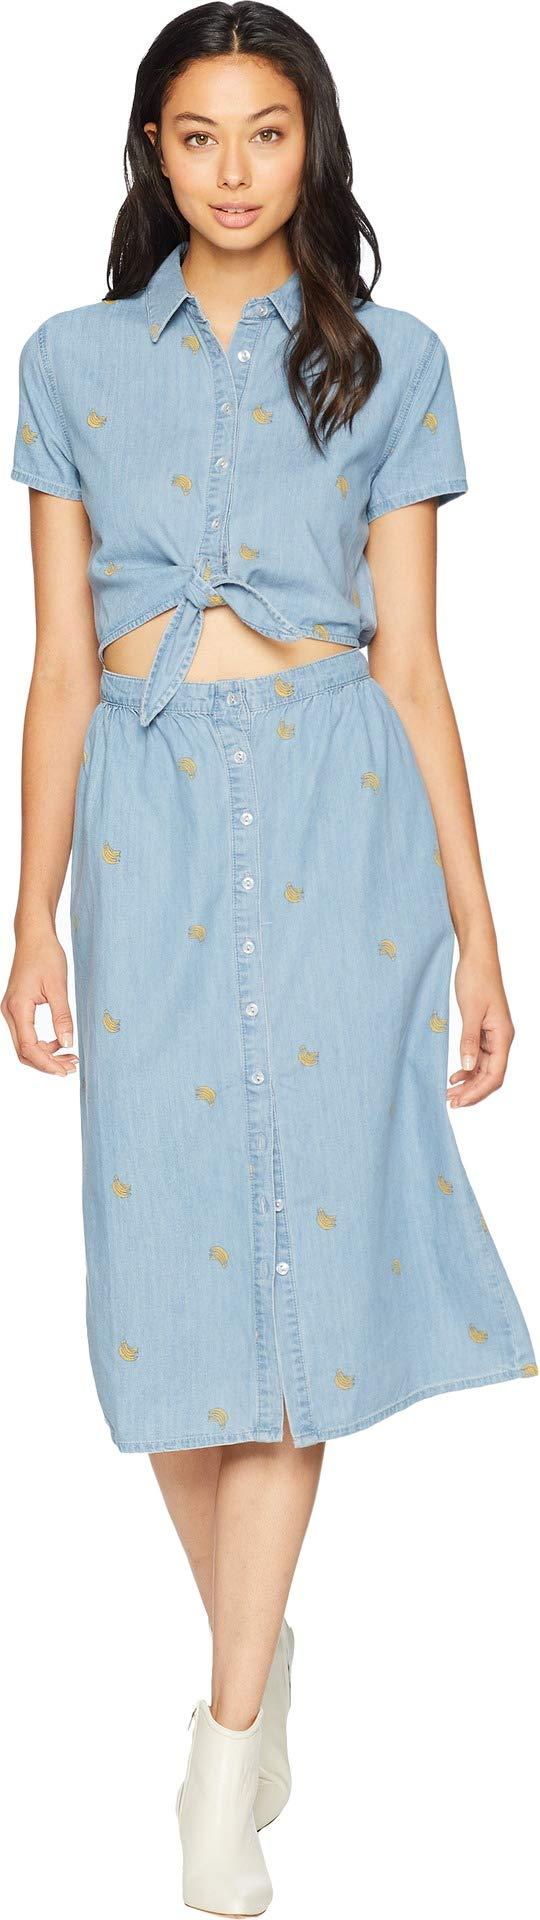 Juicy Couture Women's Banana Print Chambray Midi Shirtdress Mojave Wash Medium